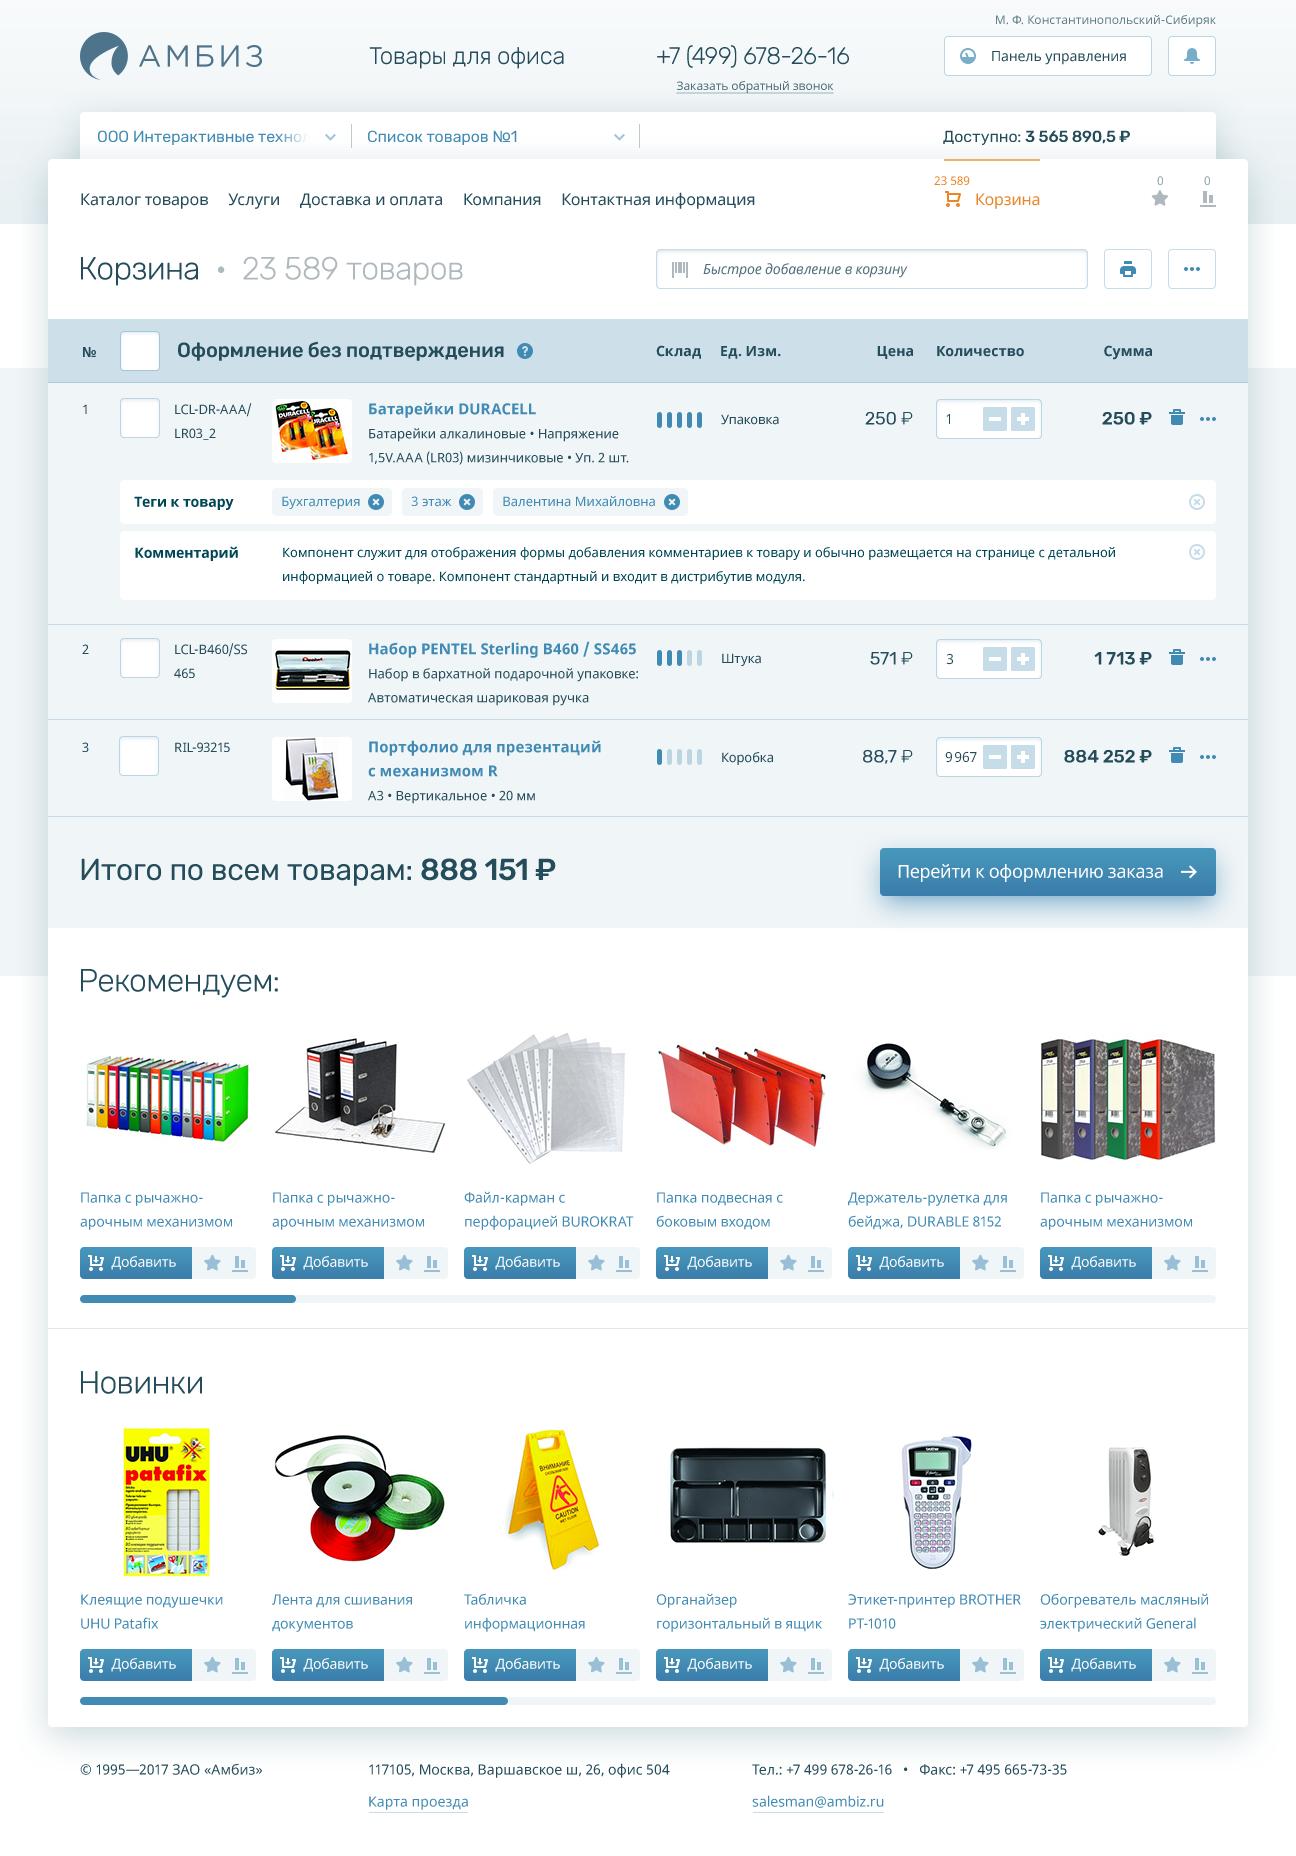 Корзина с товарами _ Товары с тегами и описанием.png